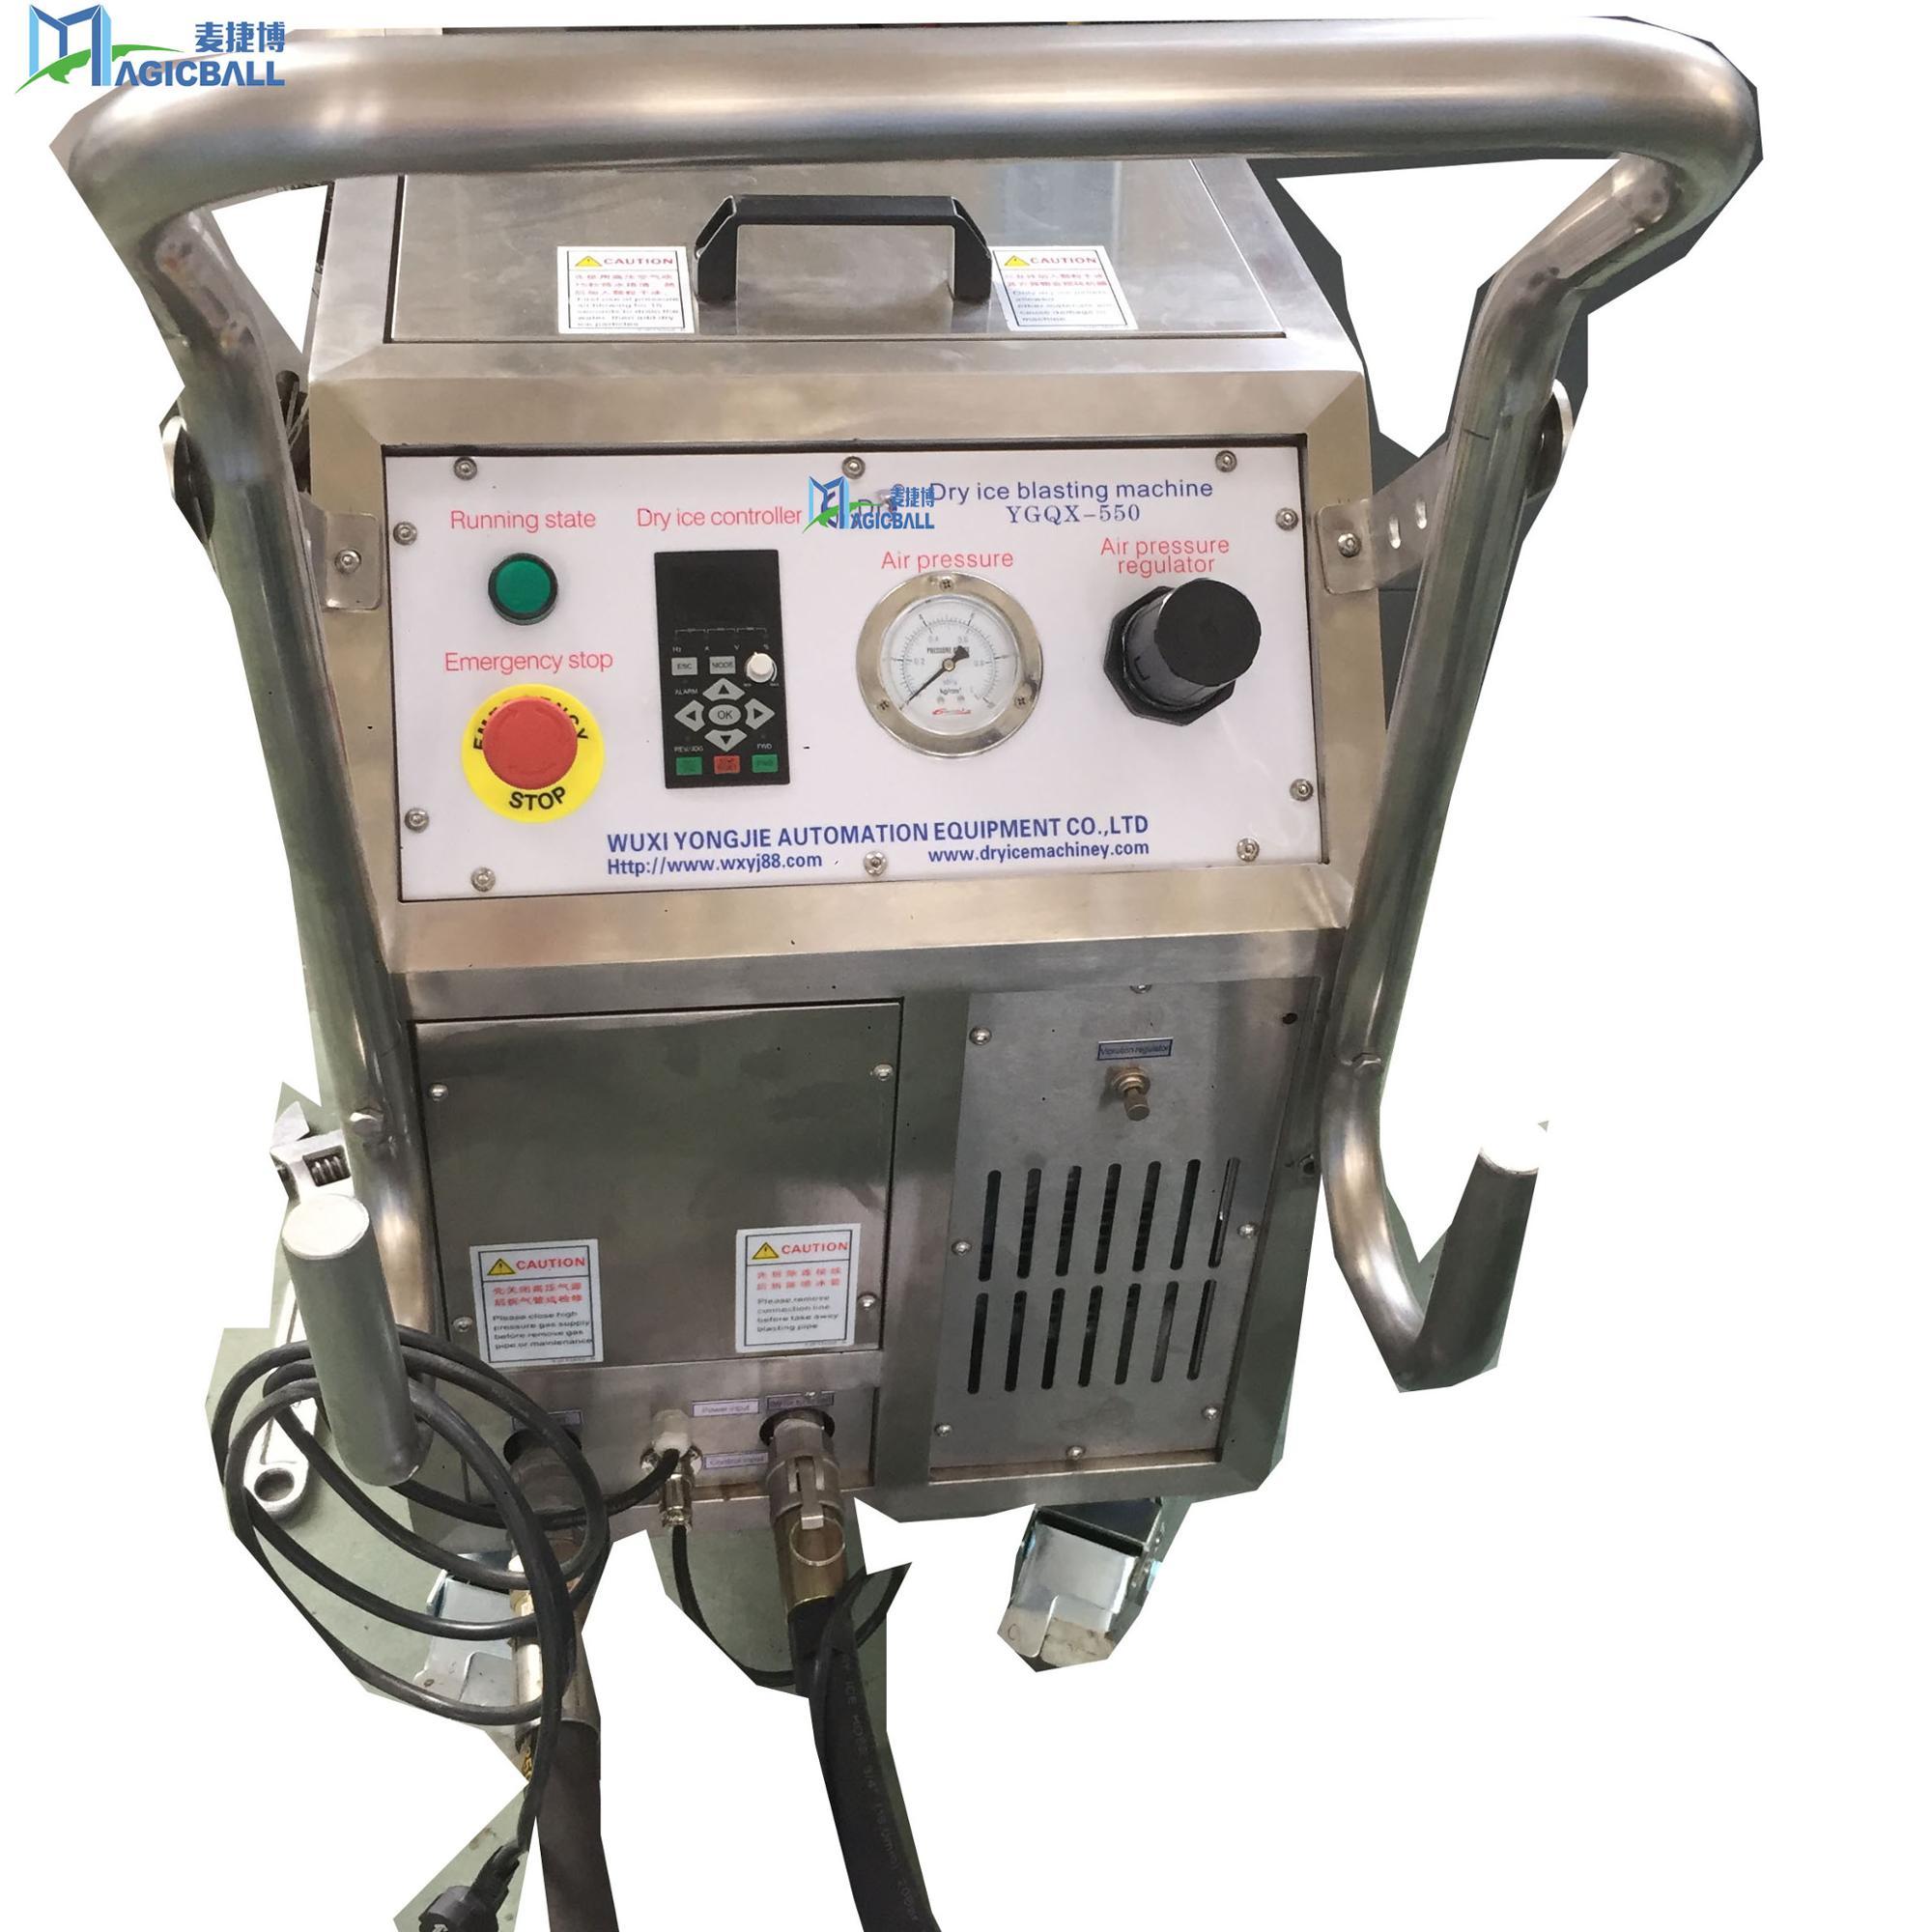 High Quality Dry Ice Blasting Machines 220v Printing Heavy ...